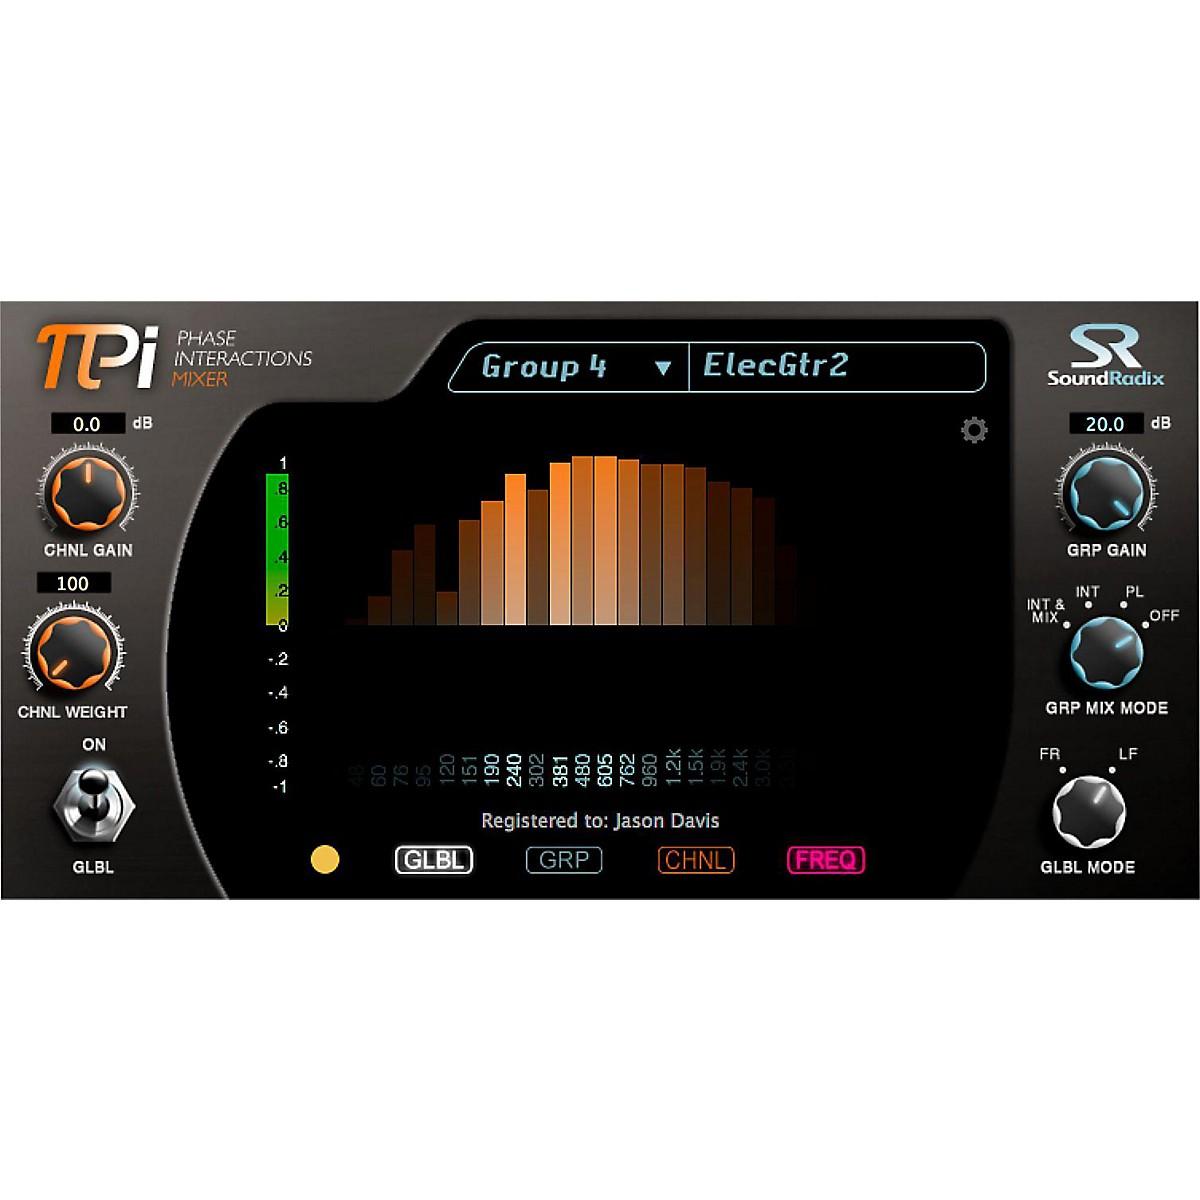 Sound Radix Pi Phase Interactions Mixer